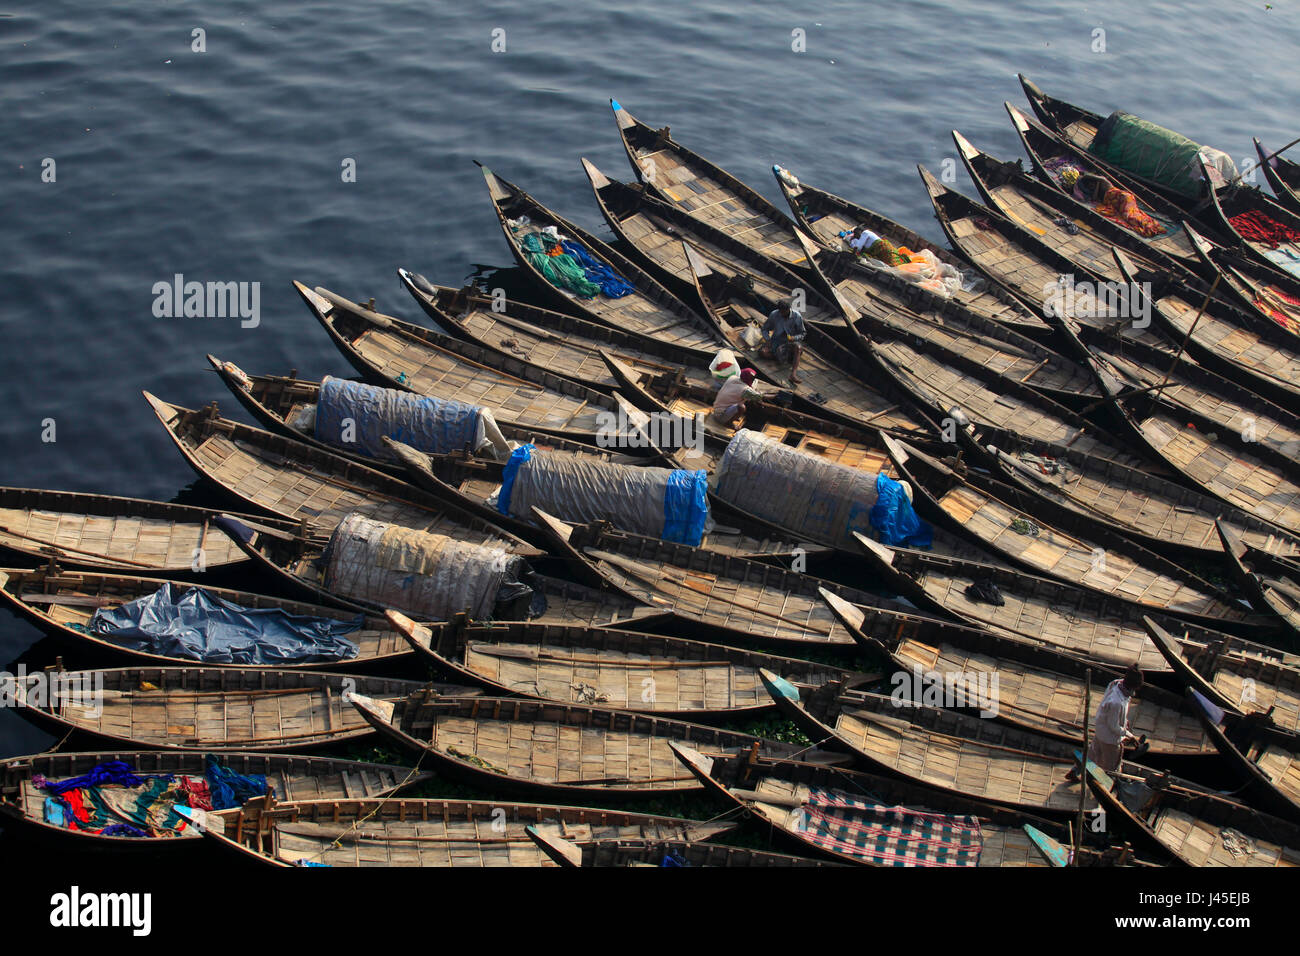 Boats are harboured on the Buriganga River at Sadarghat. Dhaka, Bangladesh. - Stock Image